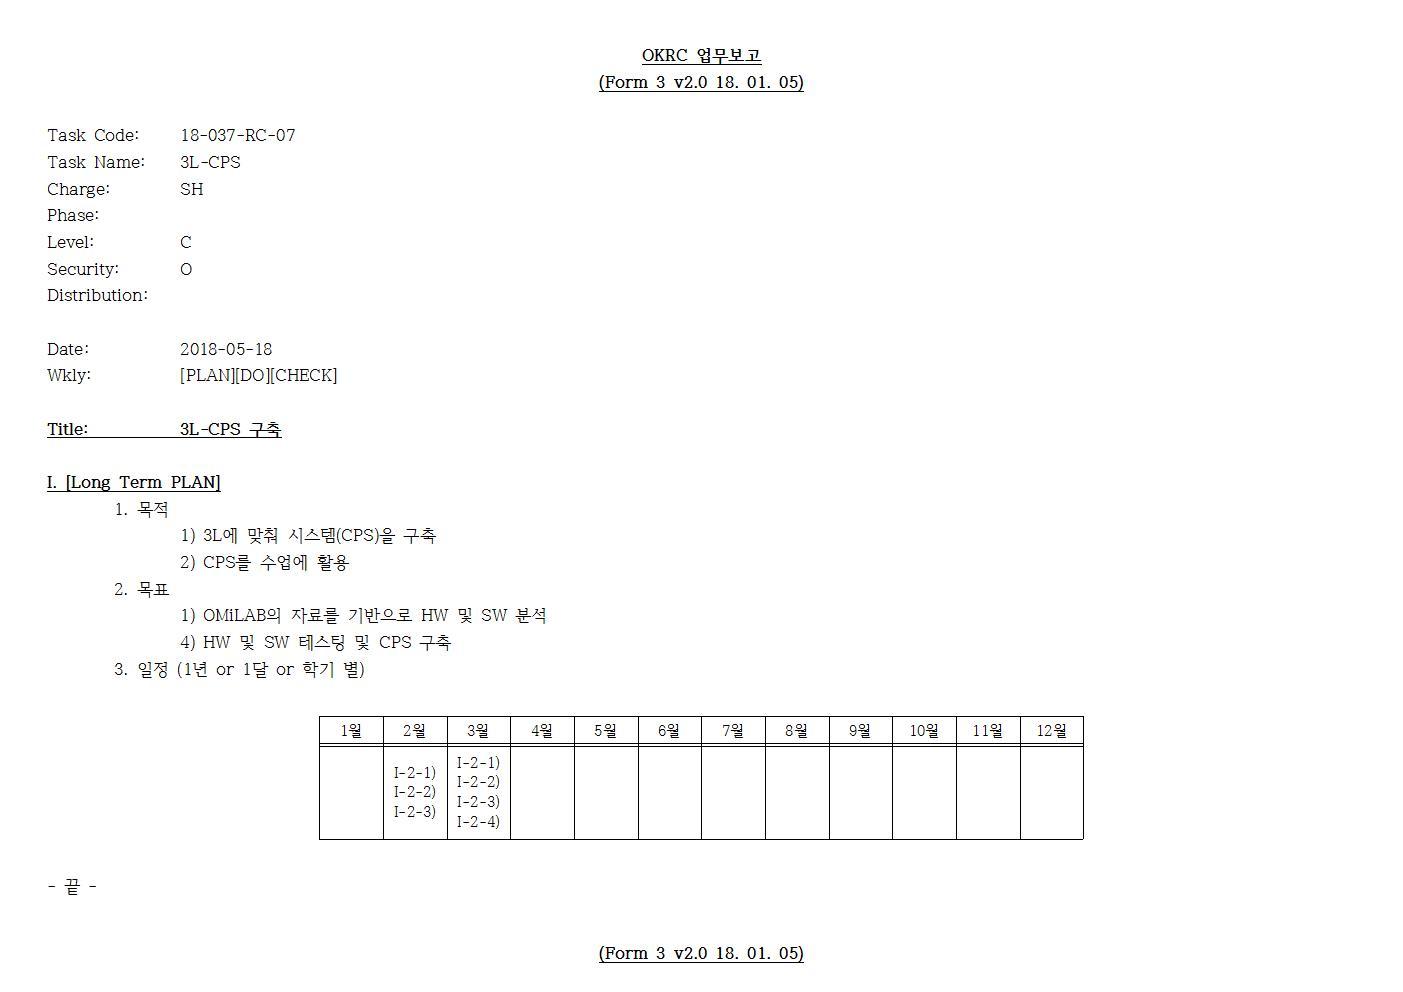 D-[18-037-RC-07]-[3L-CPS]-[2018-05-18][SH]001.jpg